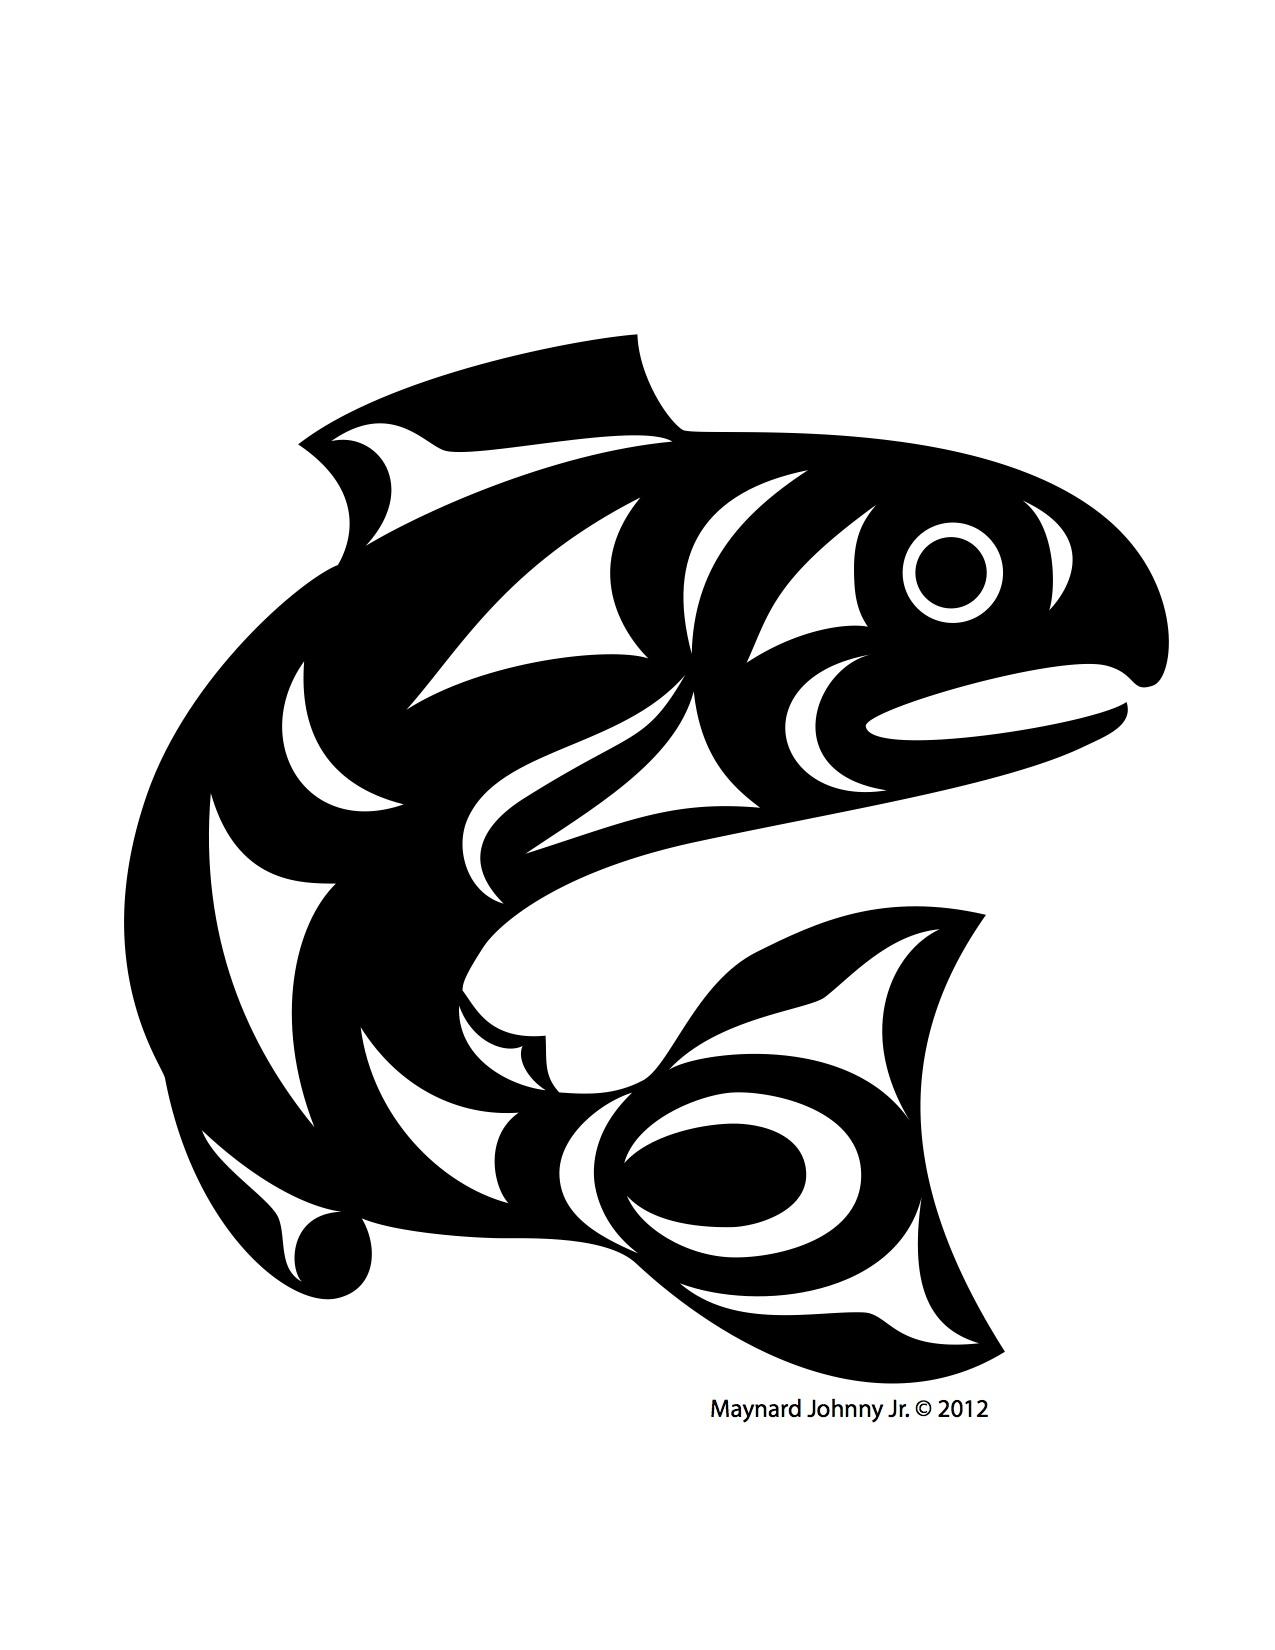 Black and white no border - Indigenous Education (1275 x 1650 Pixel)